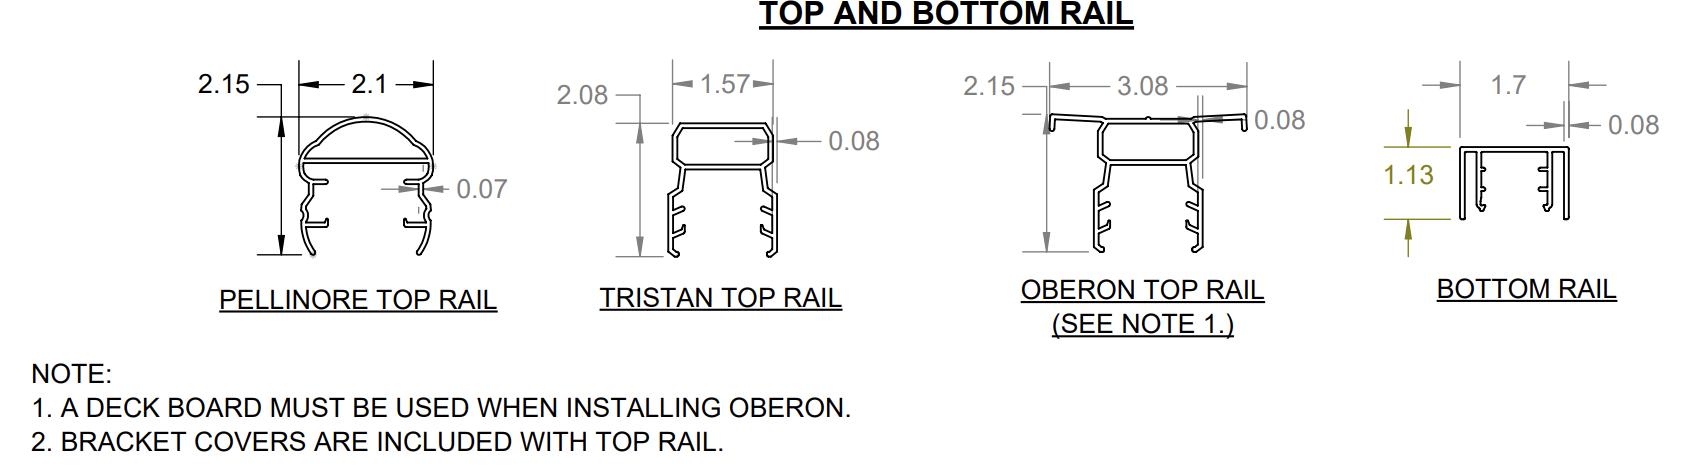 avalon-top-rail-rdi.png